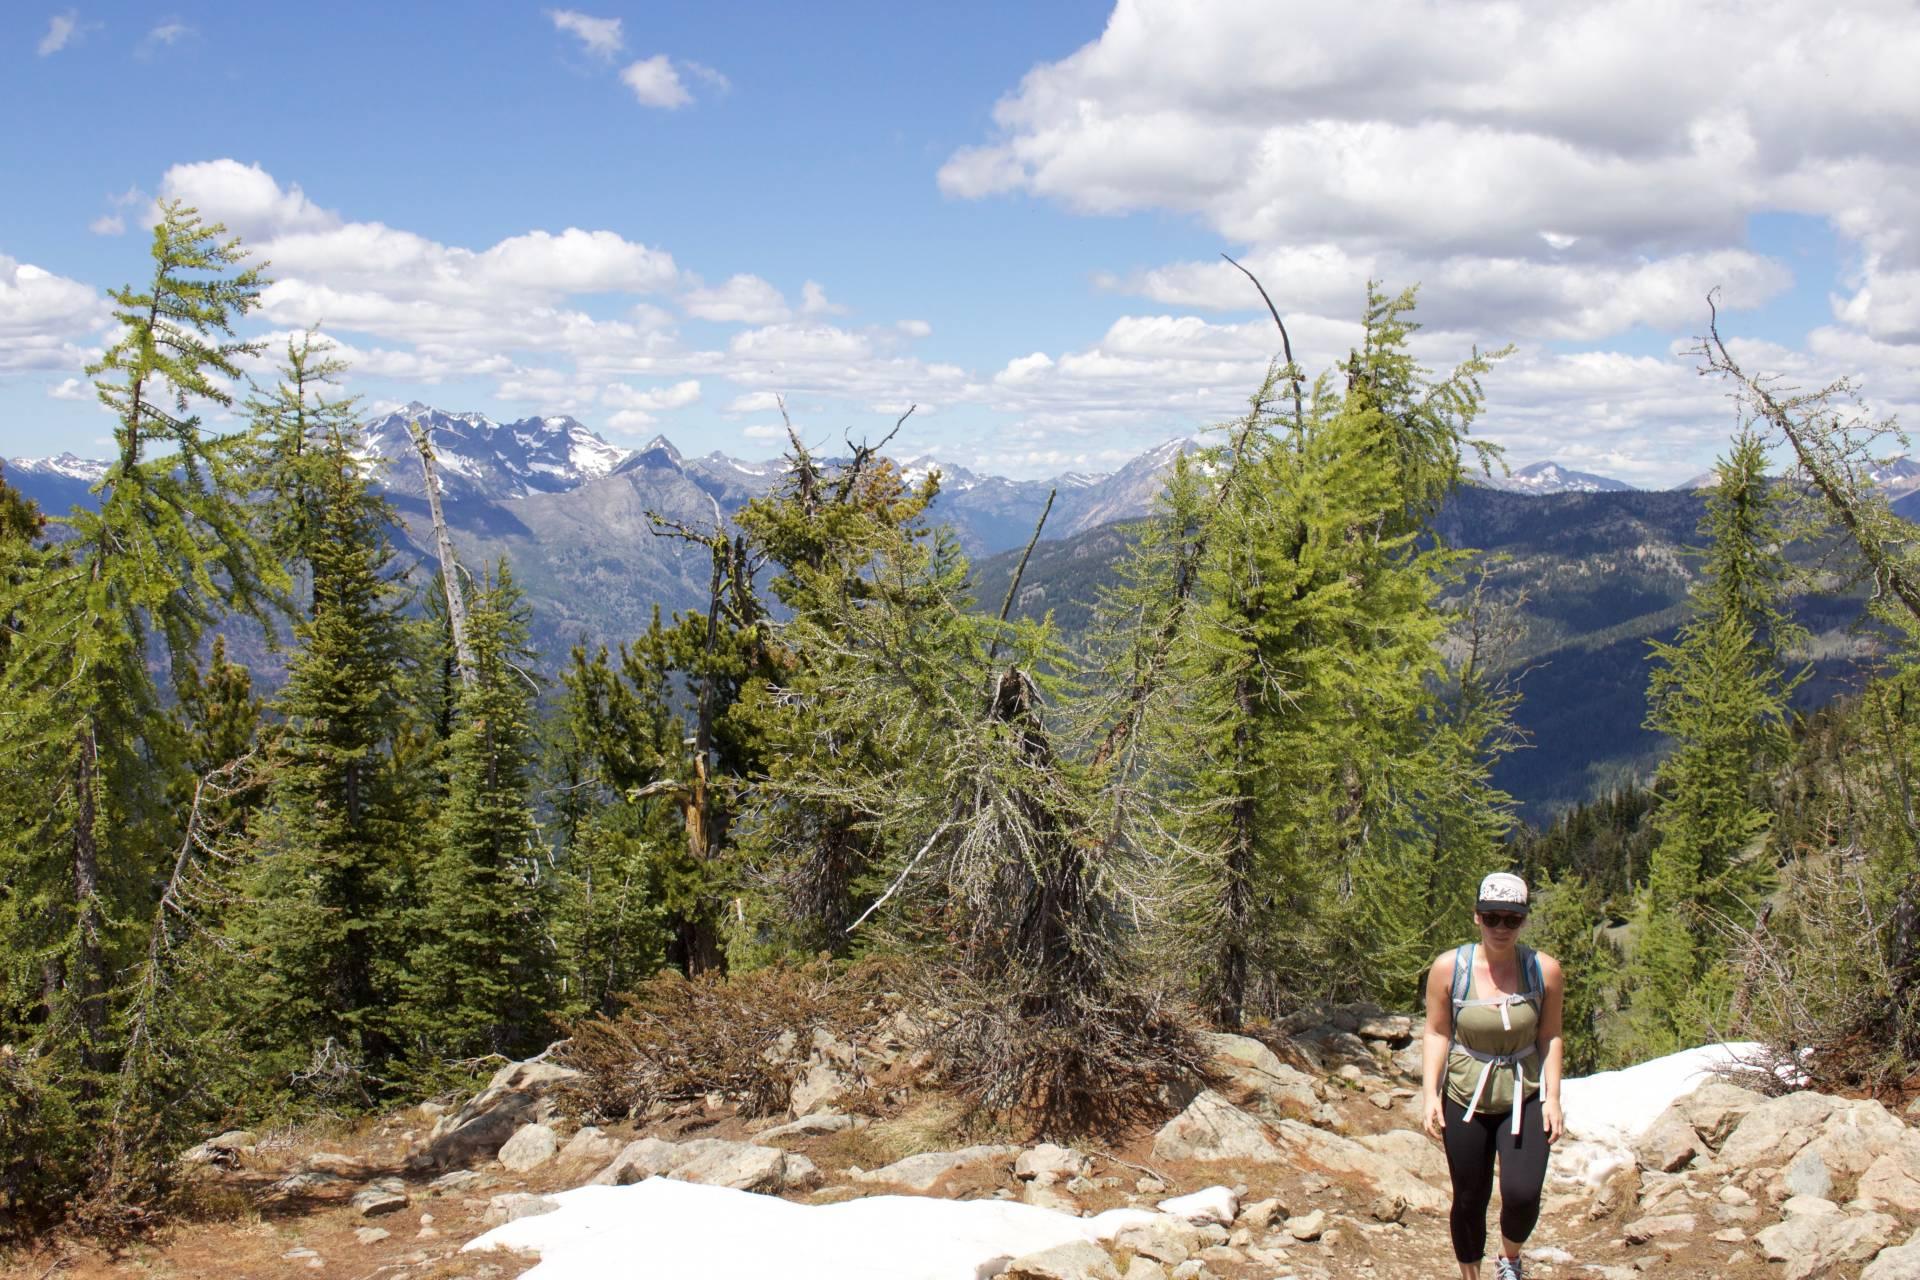 Hiking up to Goat Peak Lookout in Mazama, WA